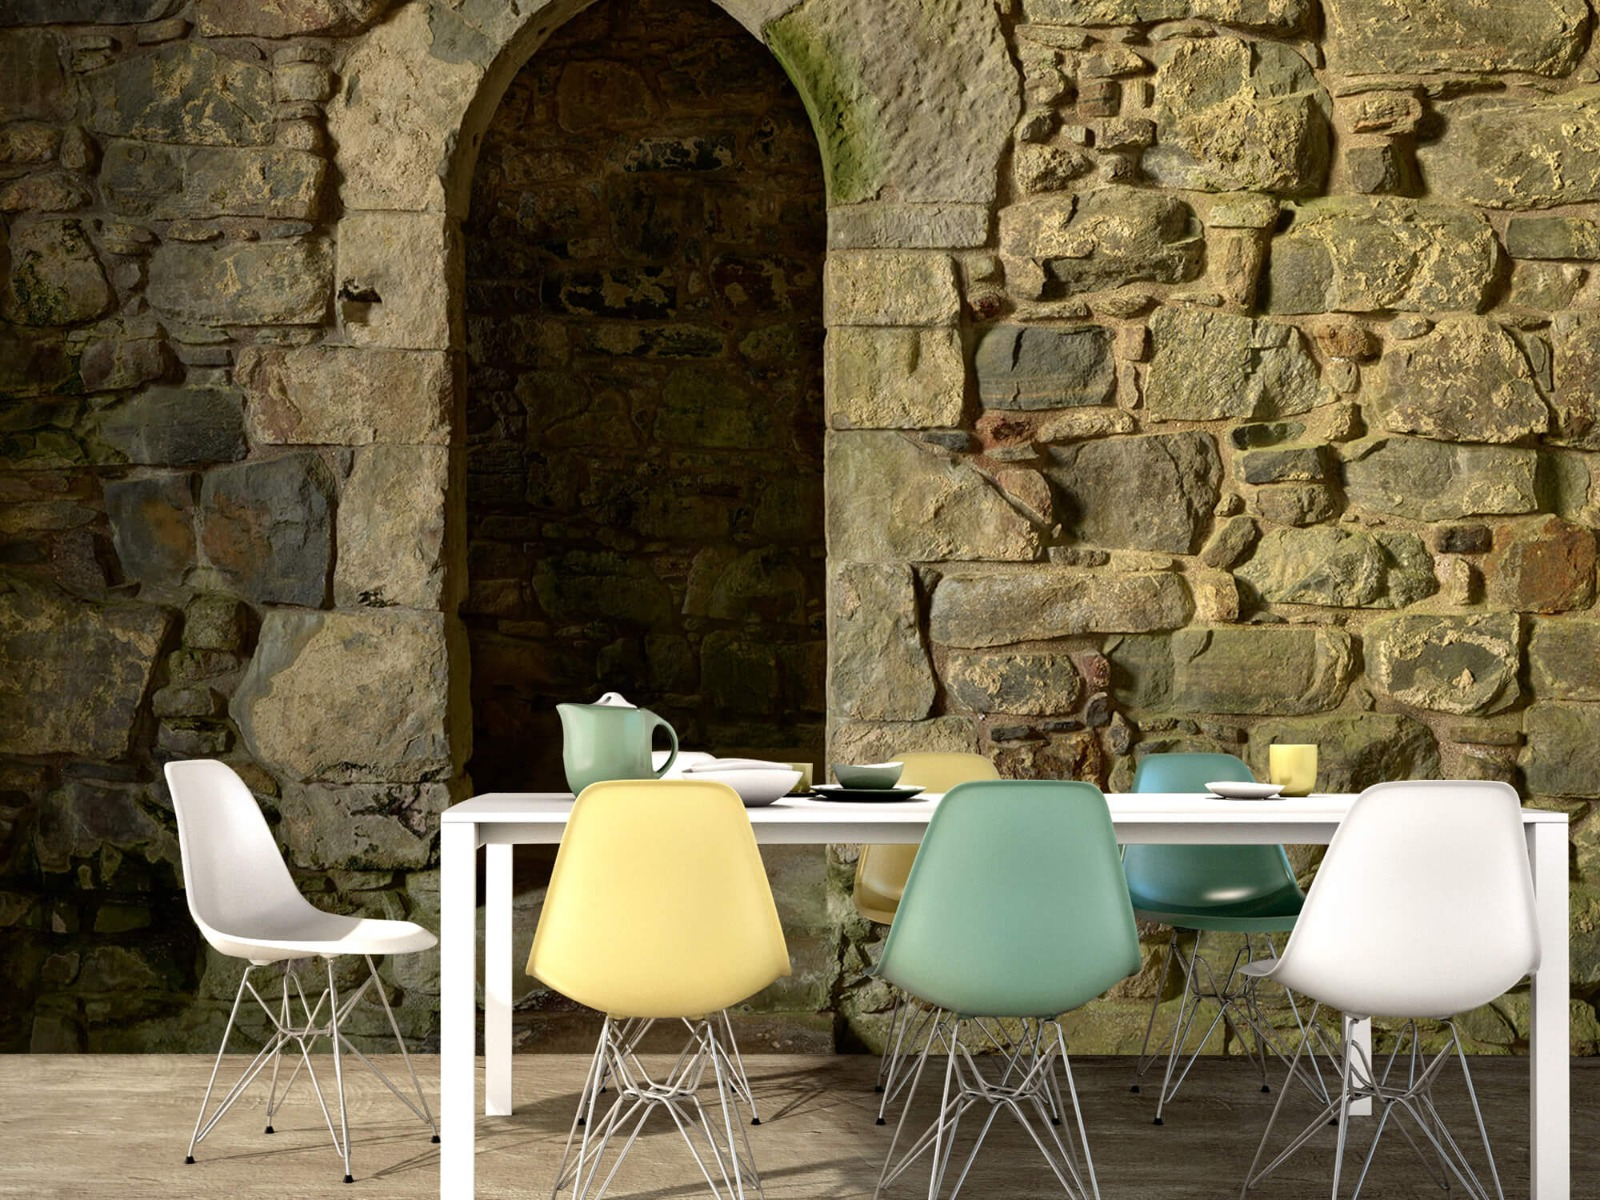 Steen behang - Oude muur met doorgang - Slaapkamer 15